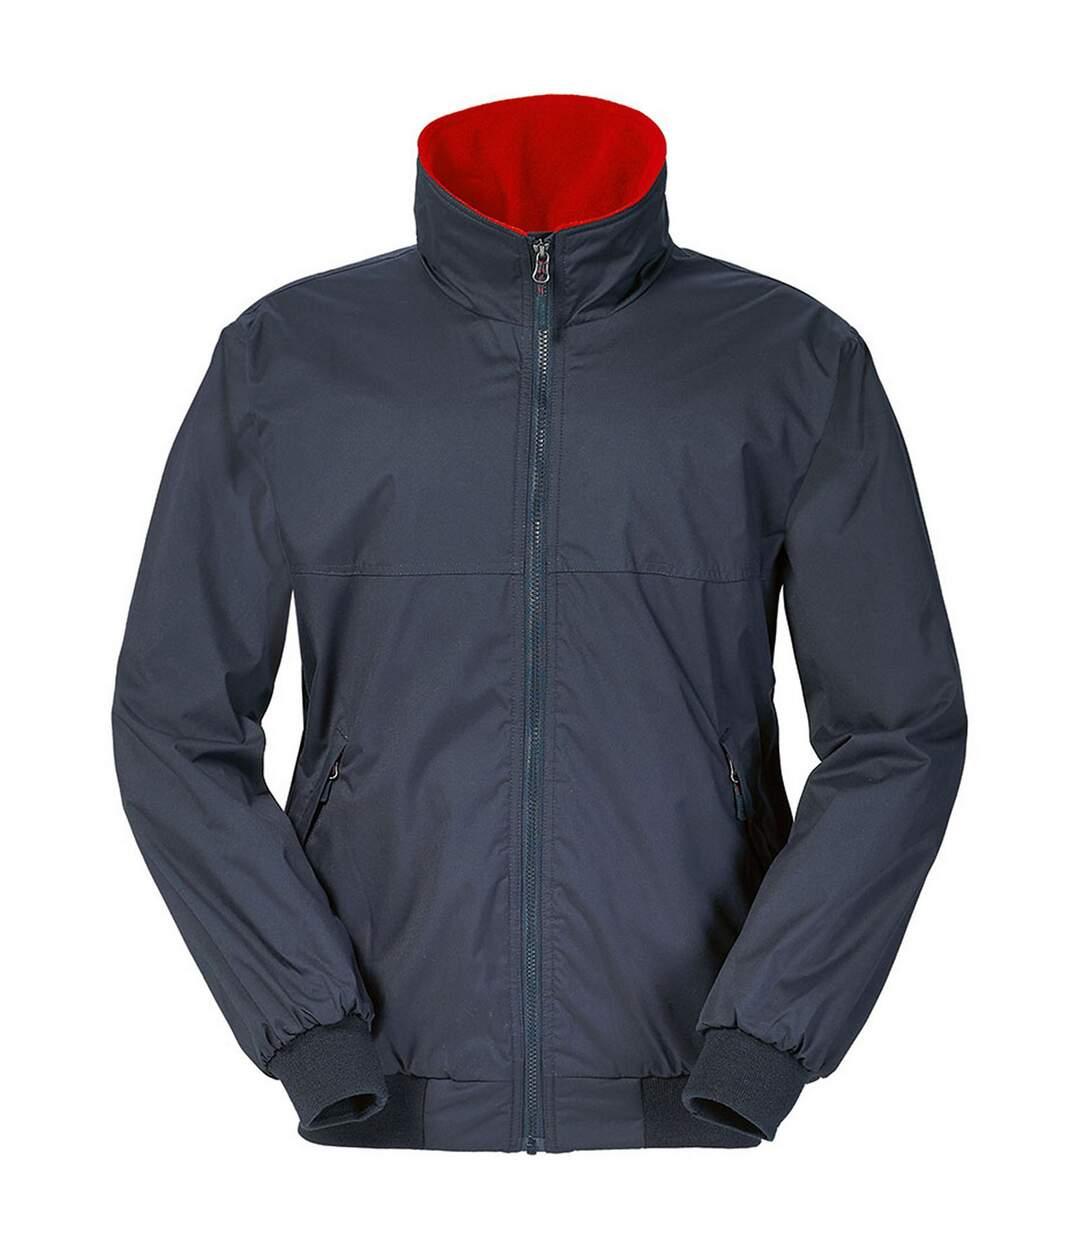 Musto Mens Snug Blouson II Showerproof Jacket (Black/Black) - UTRW5600